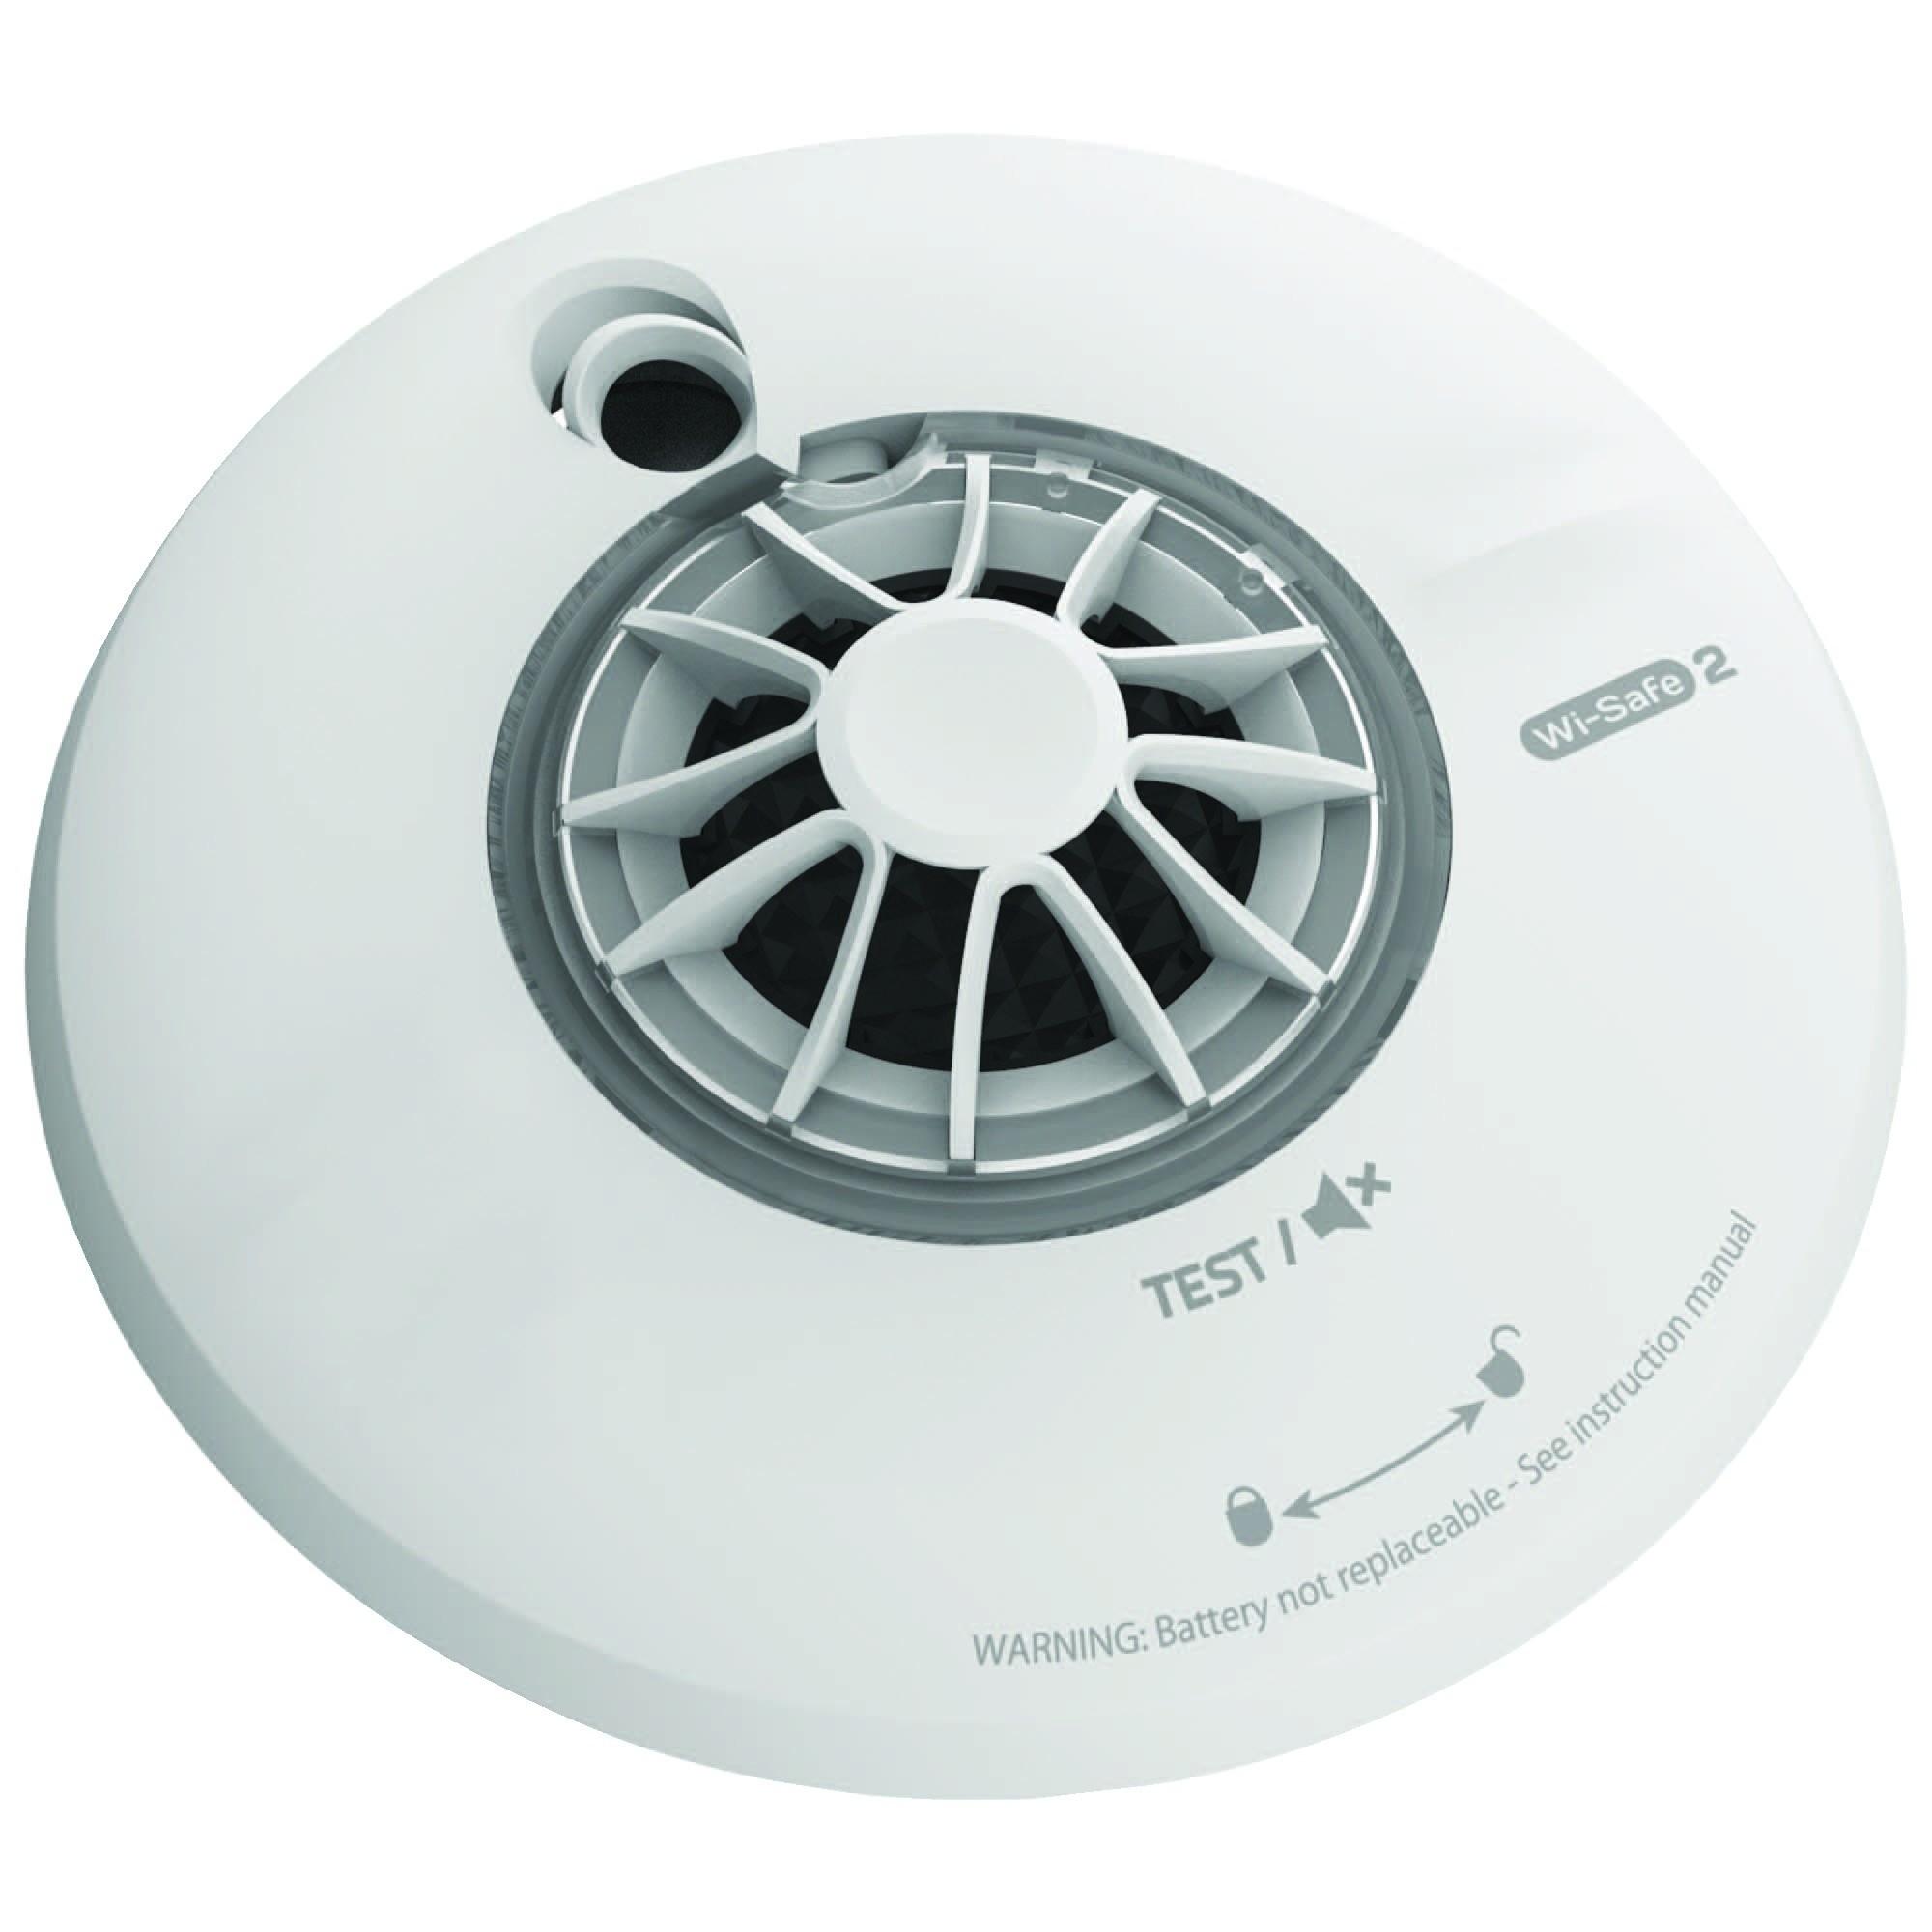 fireangel wireless interlink heat alarm detector siren 85db loud lithium batt. Black Bedroom Furniture Sets. Home Design Ideas